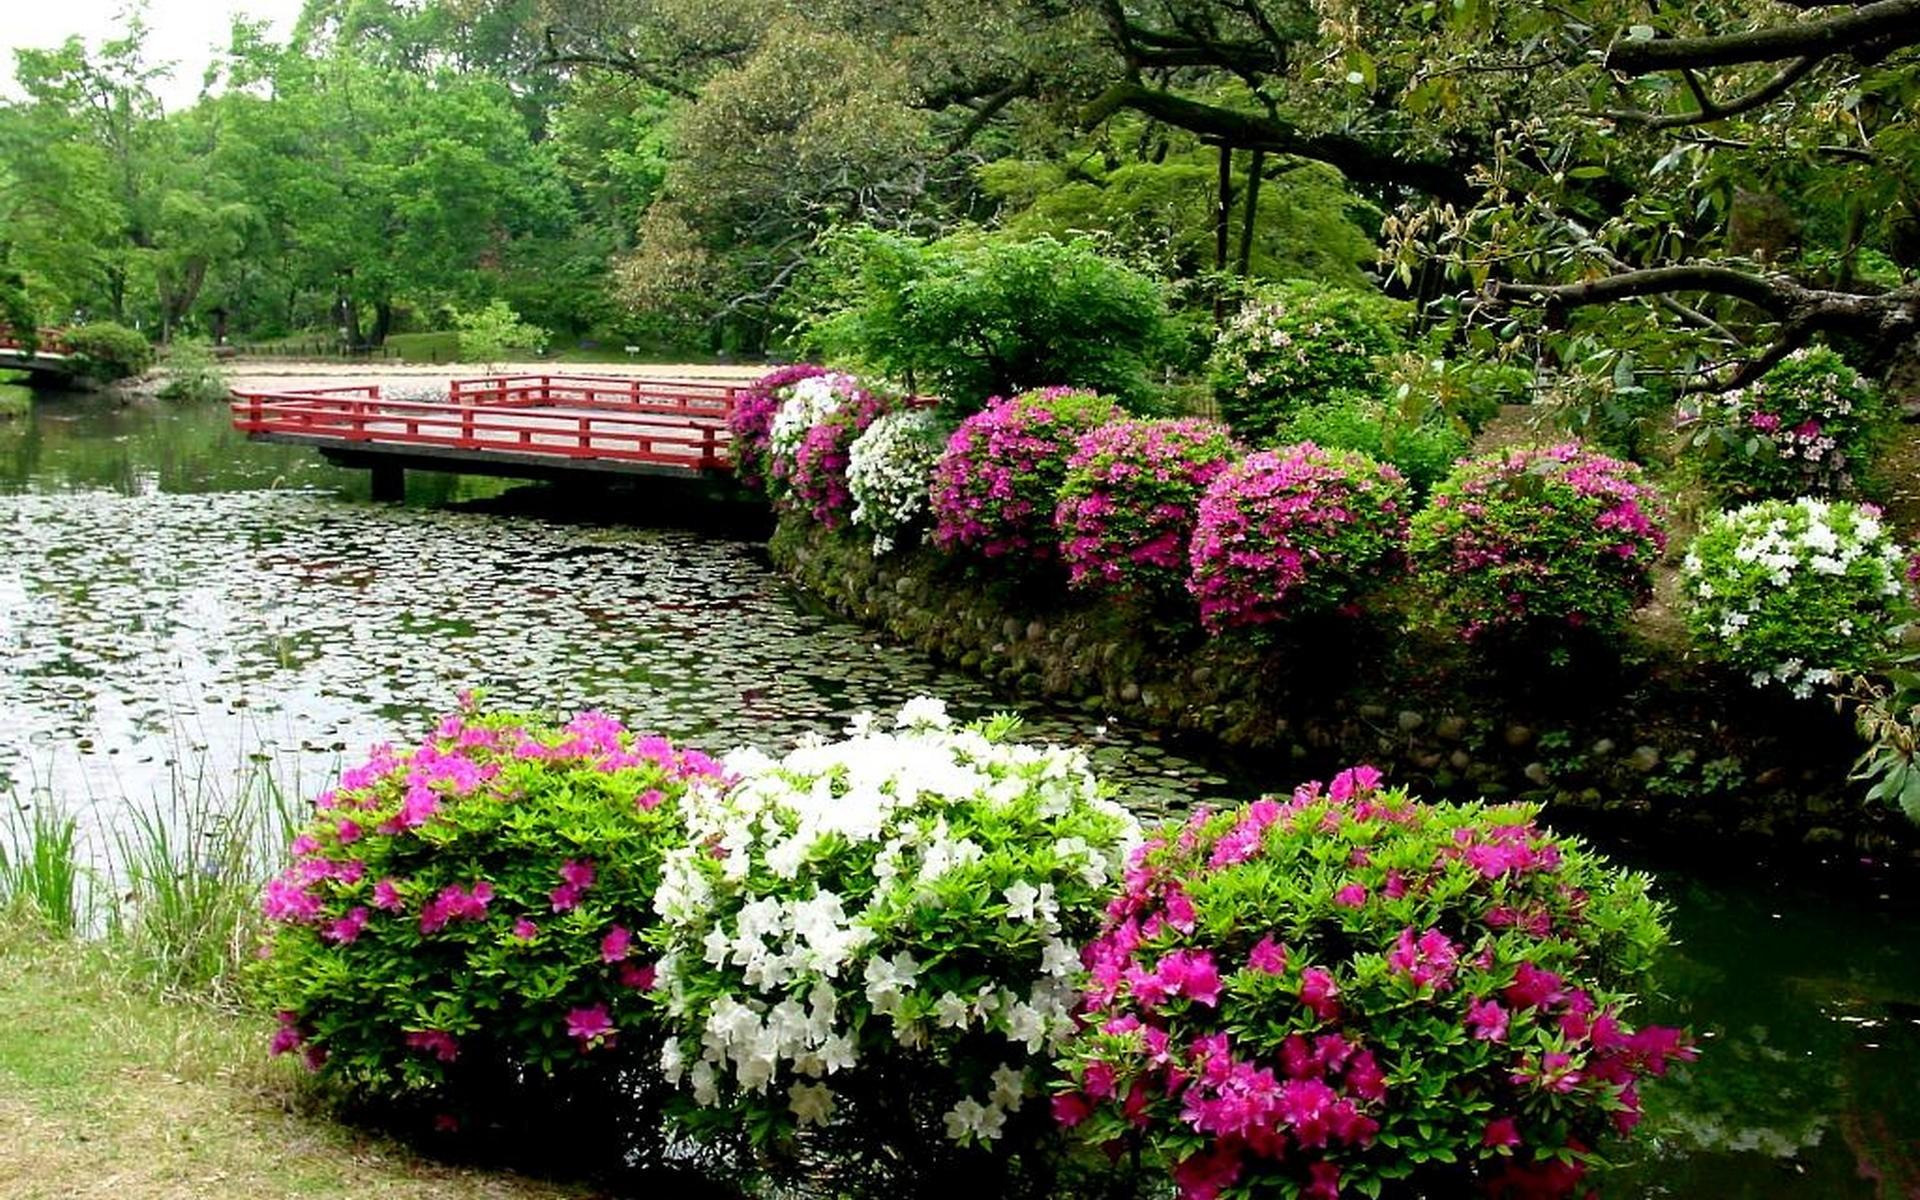 1920x1200 Japanese Garden At Huntington Library And Botanical Gardens In San Marino Ca